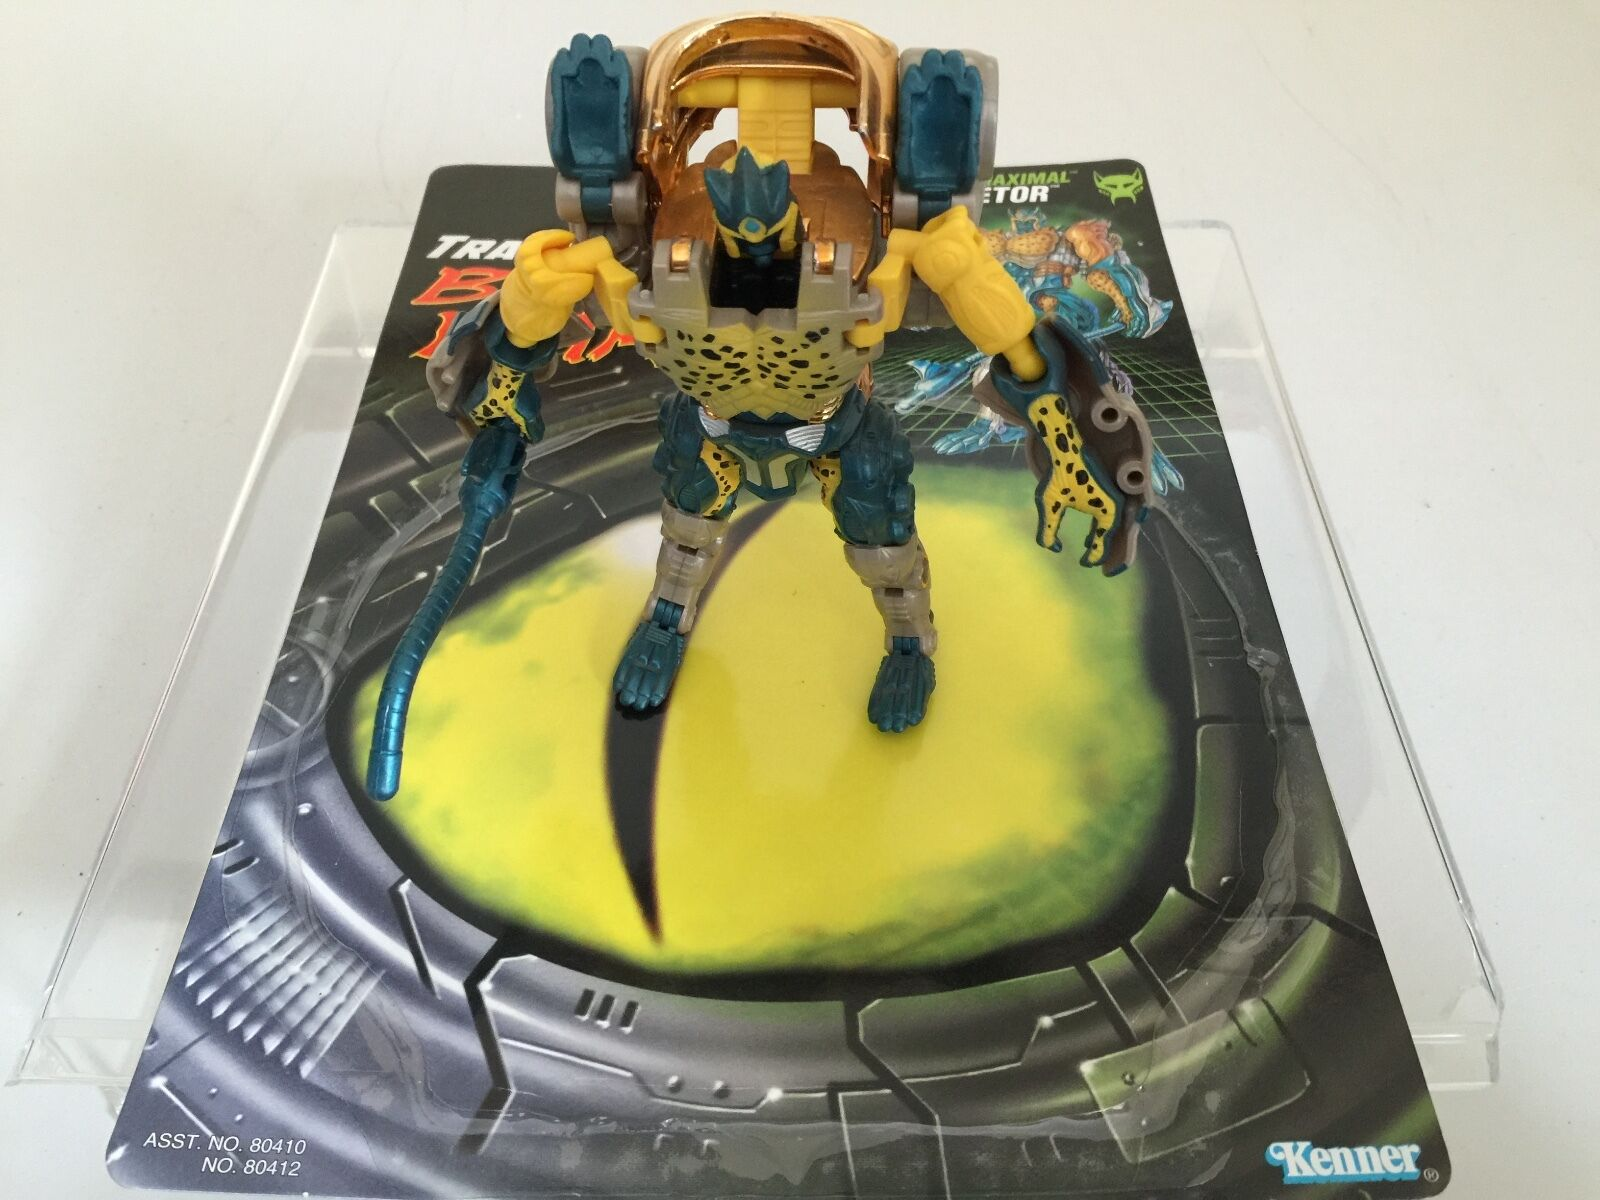 Transformers BEAST WARS 1997 CHEETOR complete figure fuzors kenner